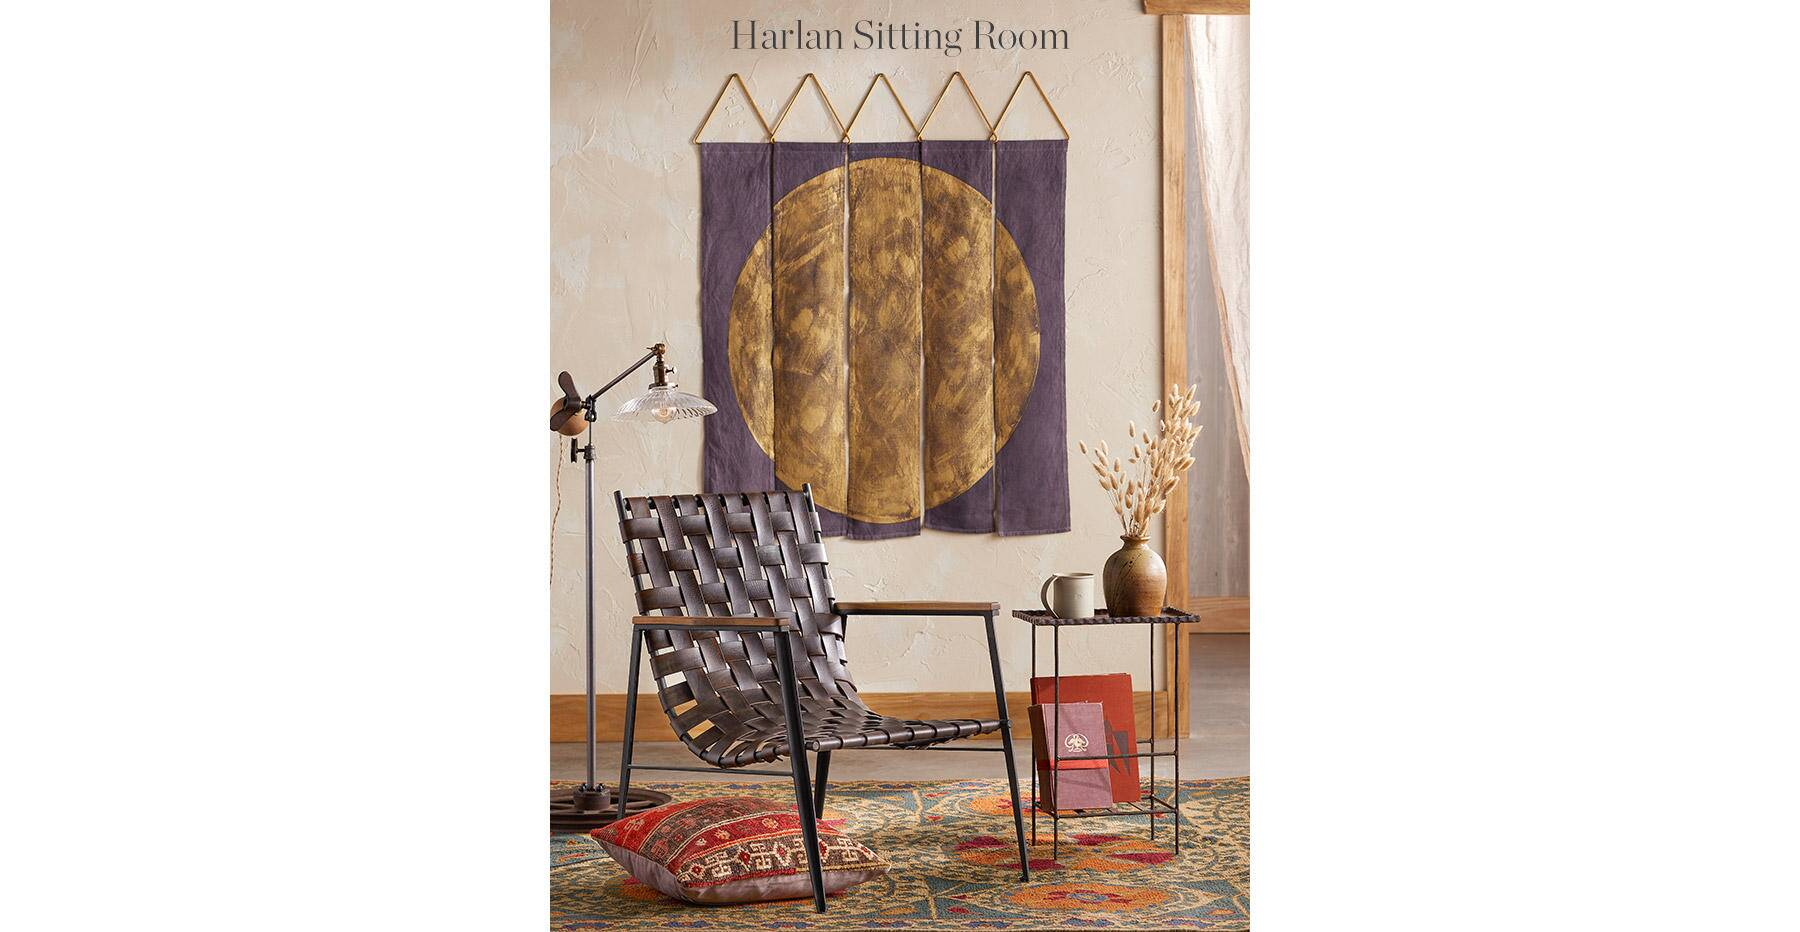 Harlan Sitting Room